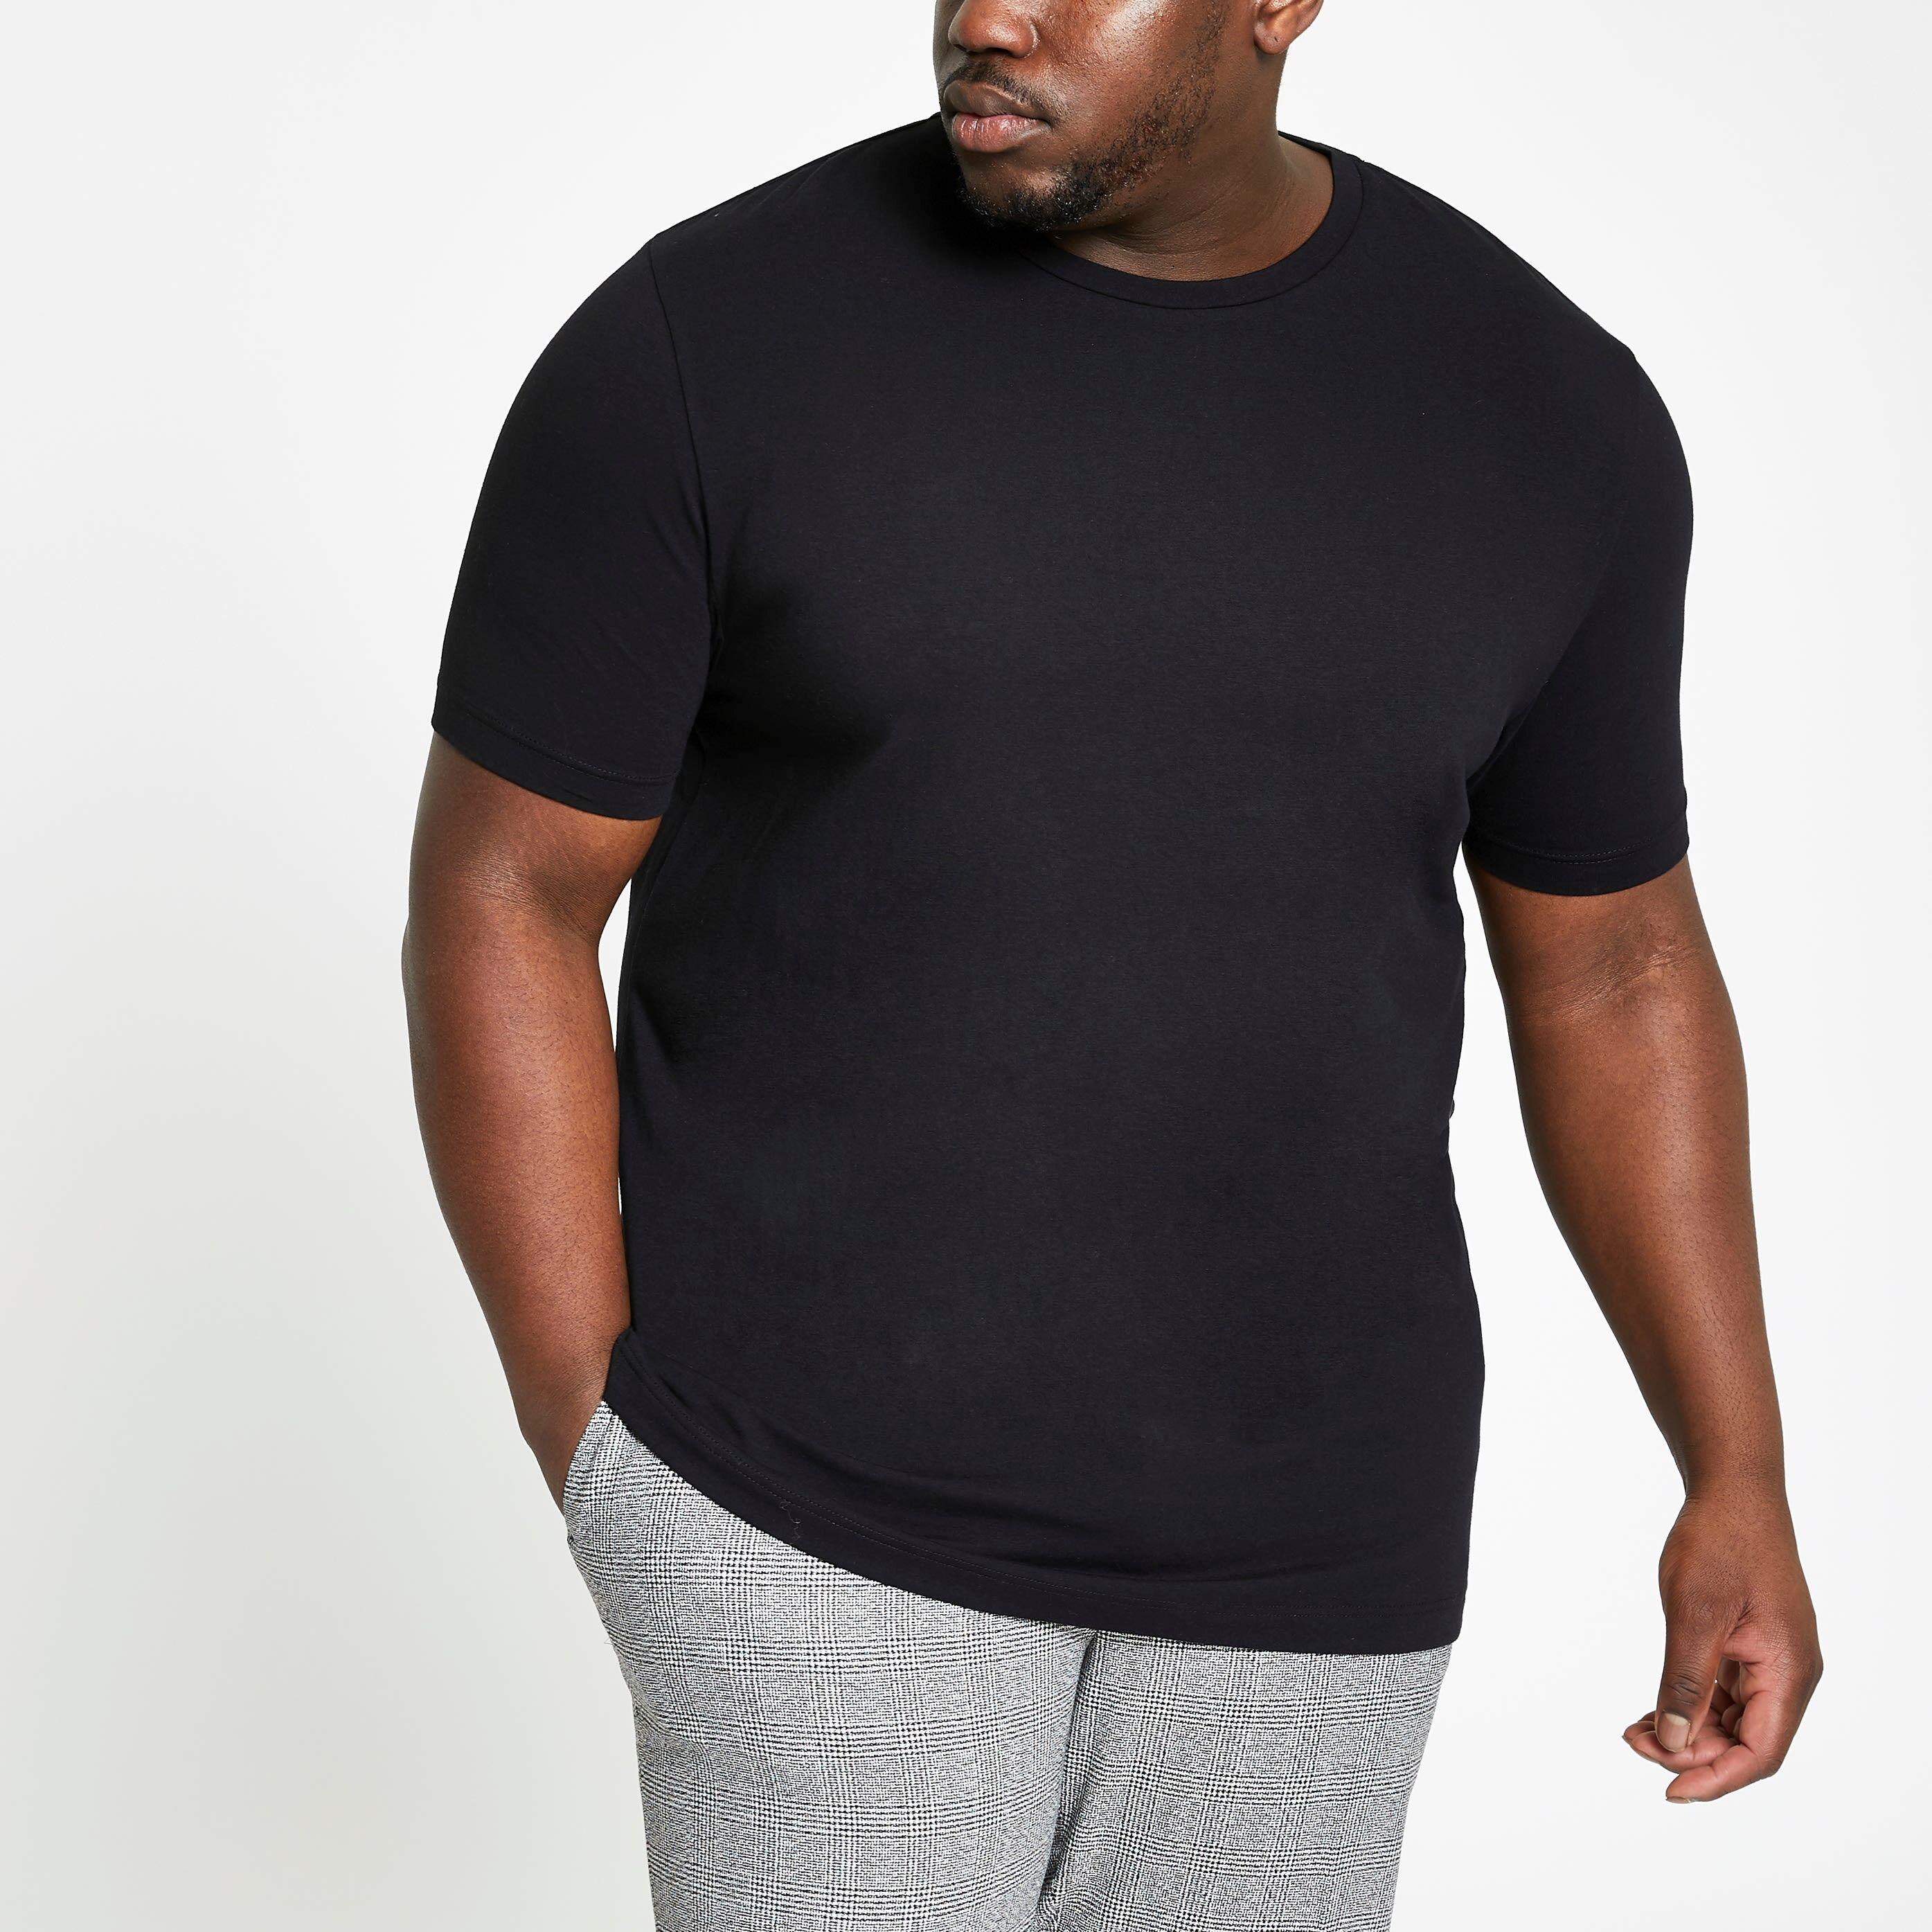 River Island Mens Big and Tall Black crew neck T-shirt (XL)